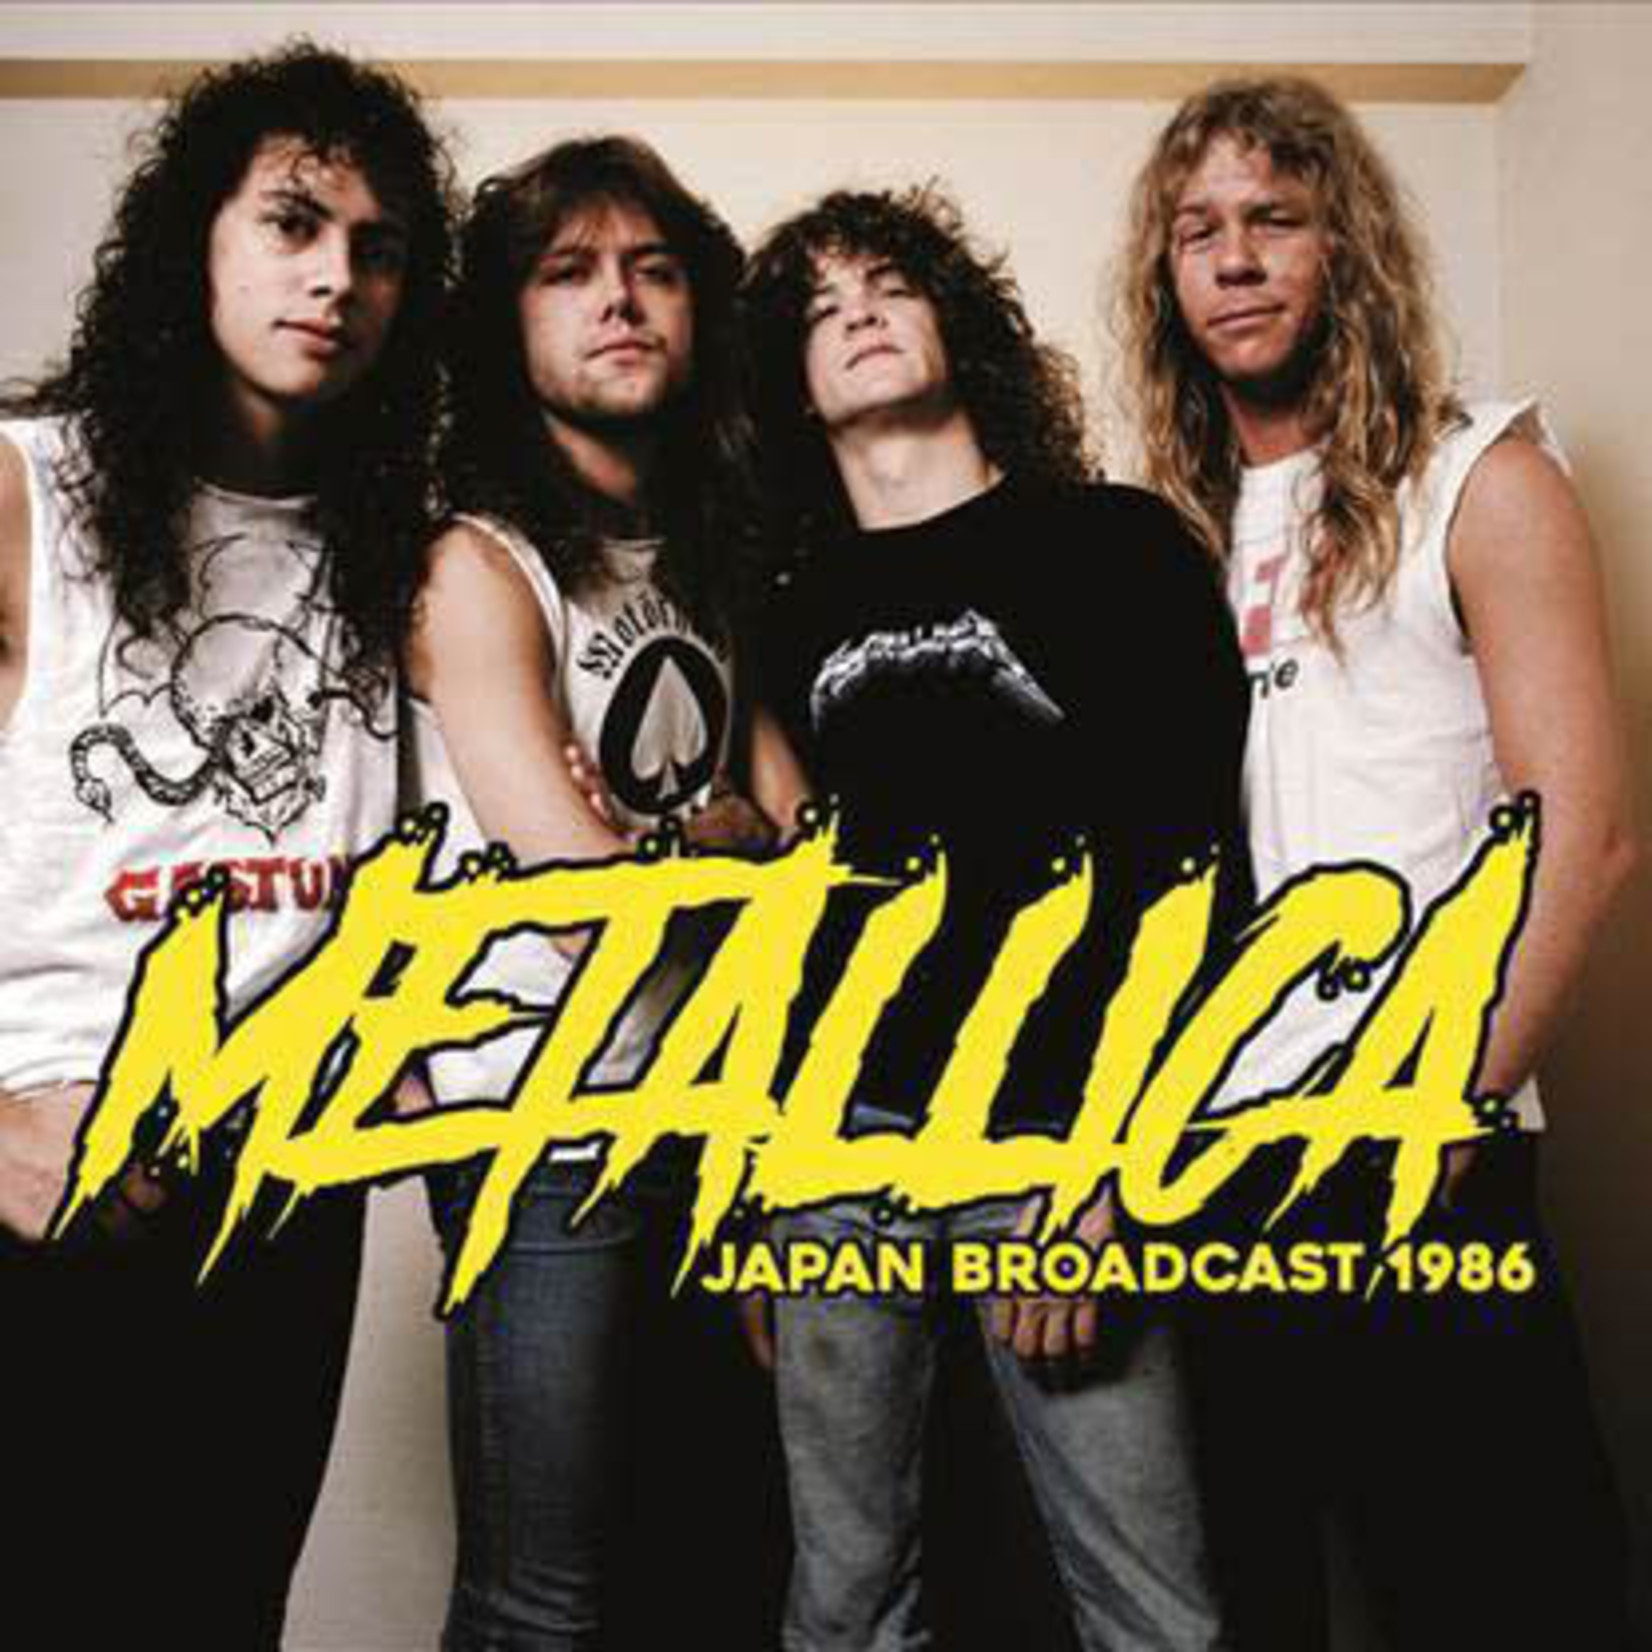 [New] Metallica: Japan Broadcast 1986 (2LP)